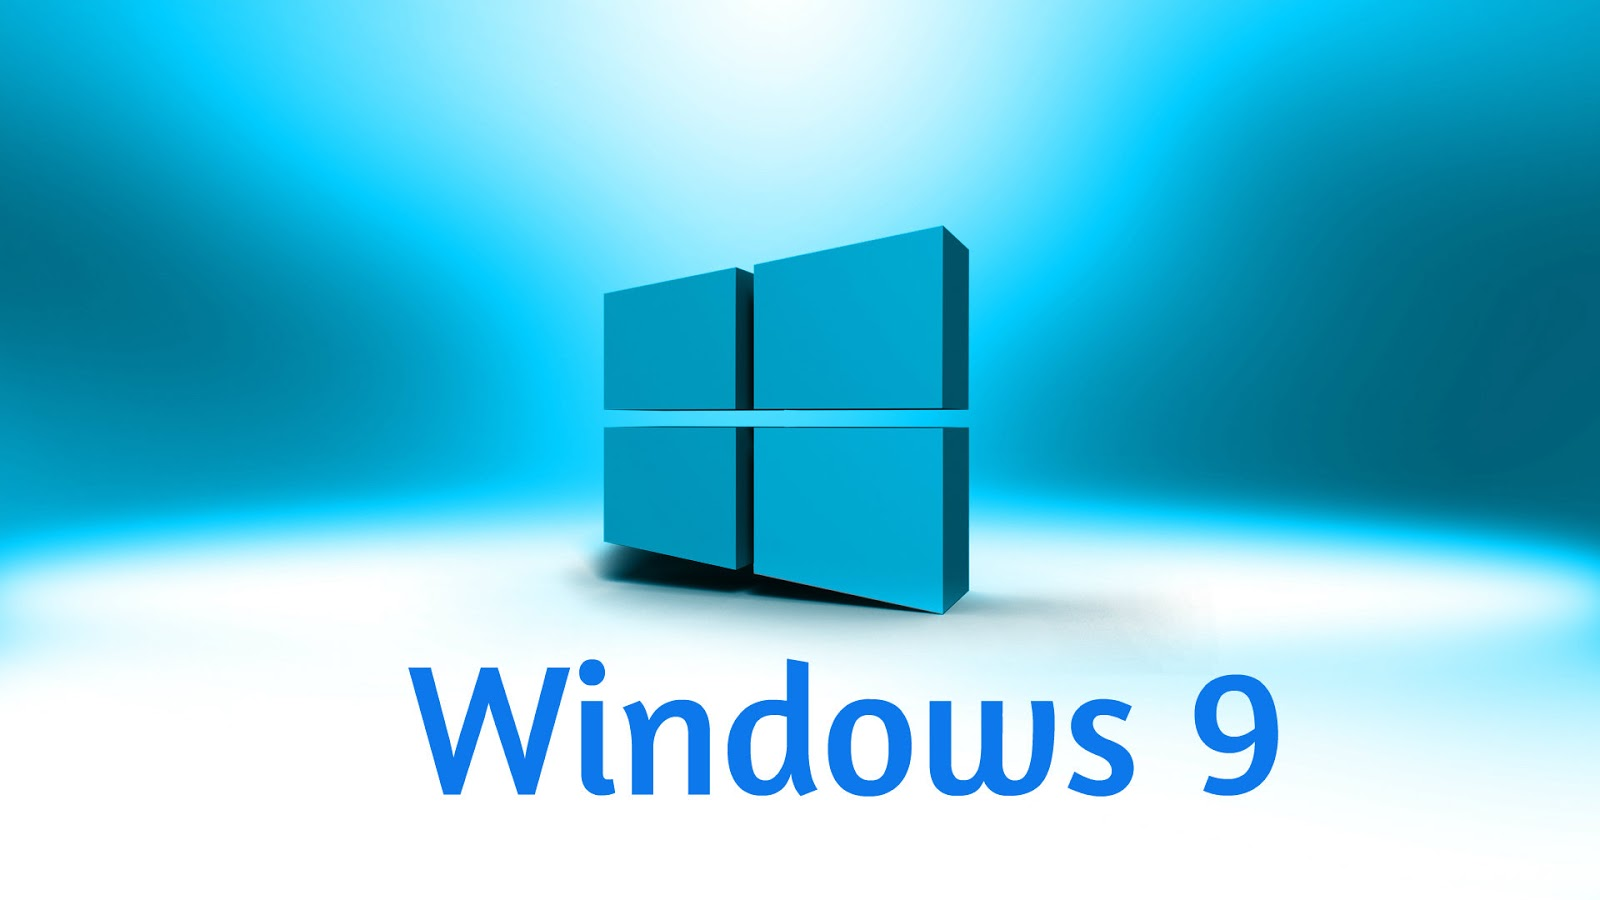 Windows%209%20release%20date%20is%20November%202014.jpg